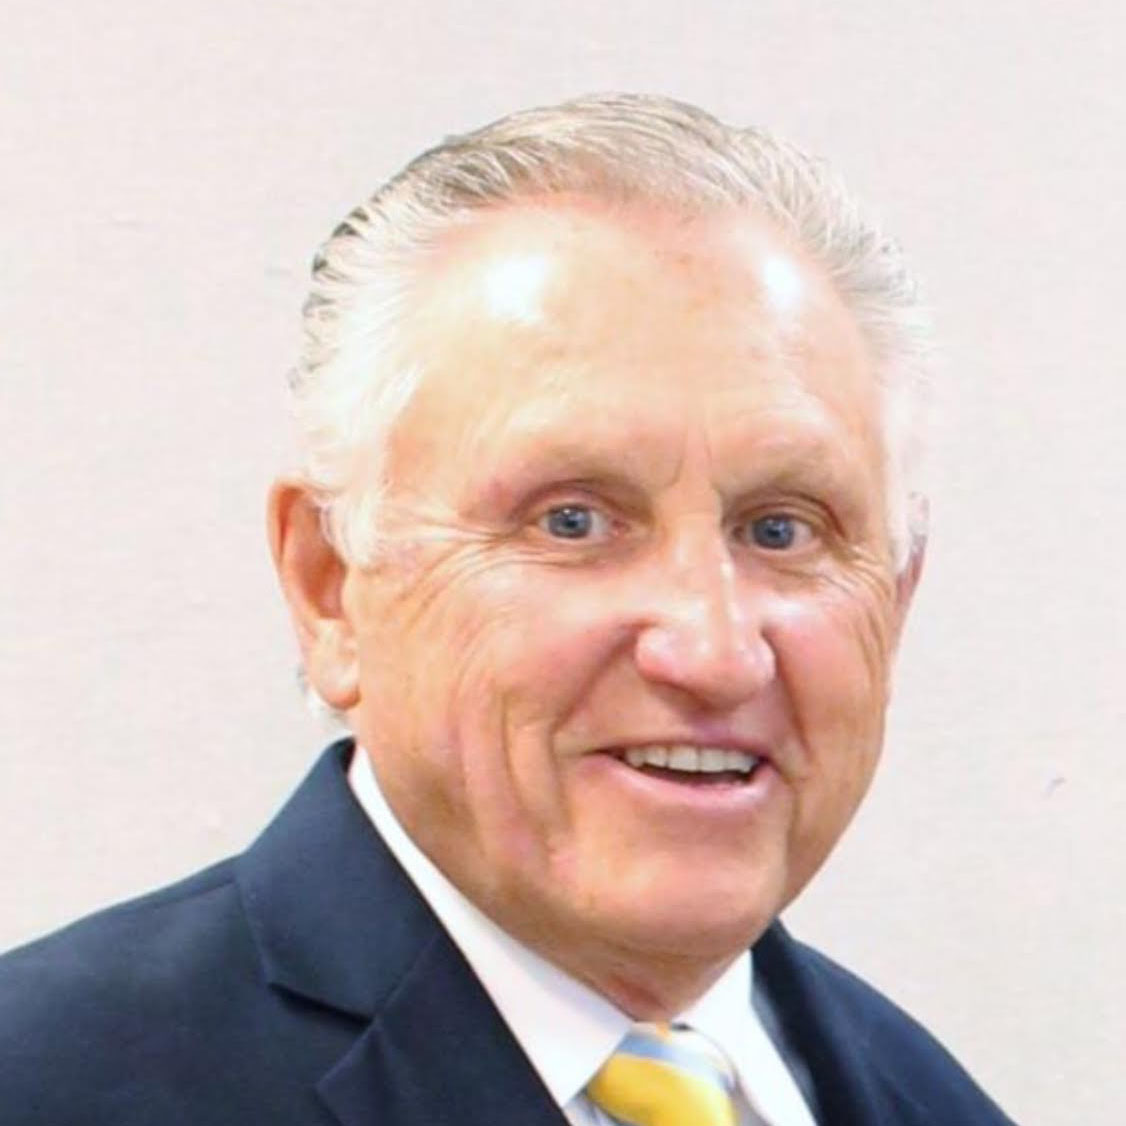 Mike Penn